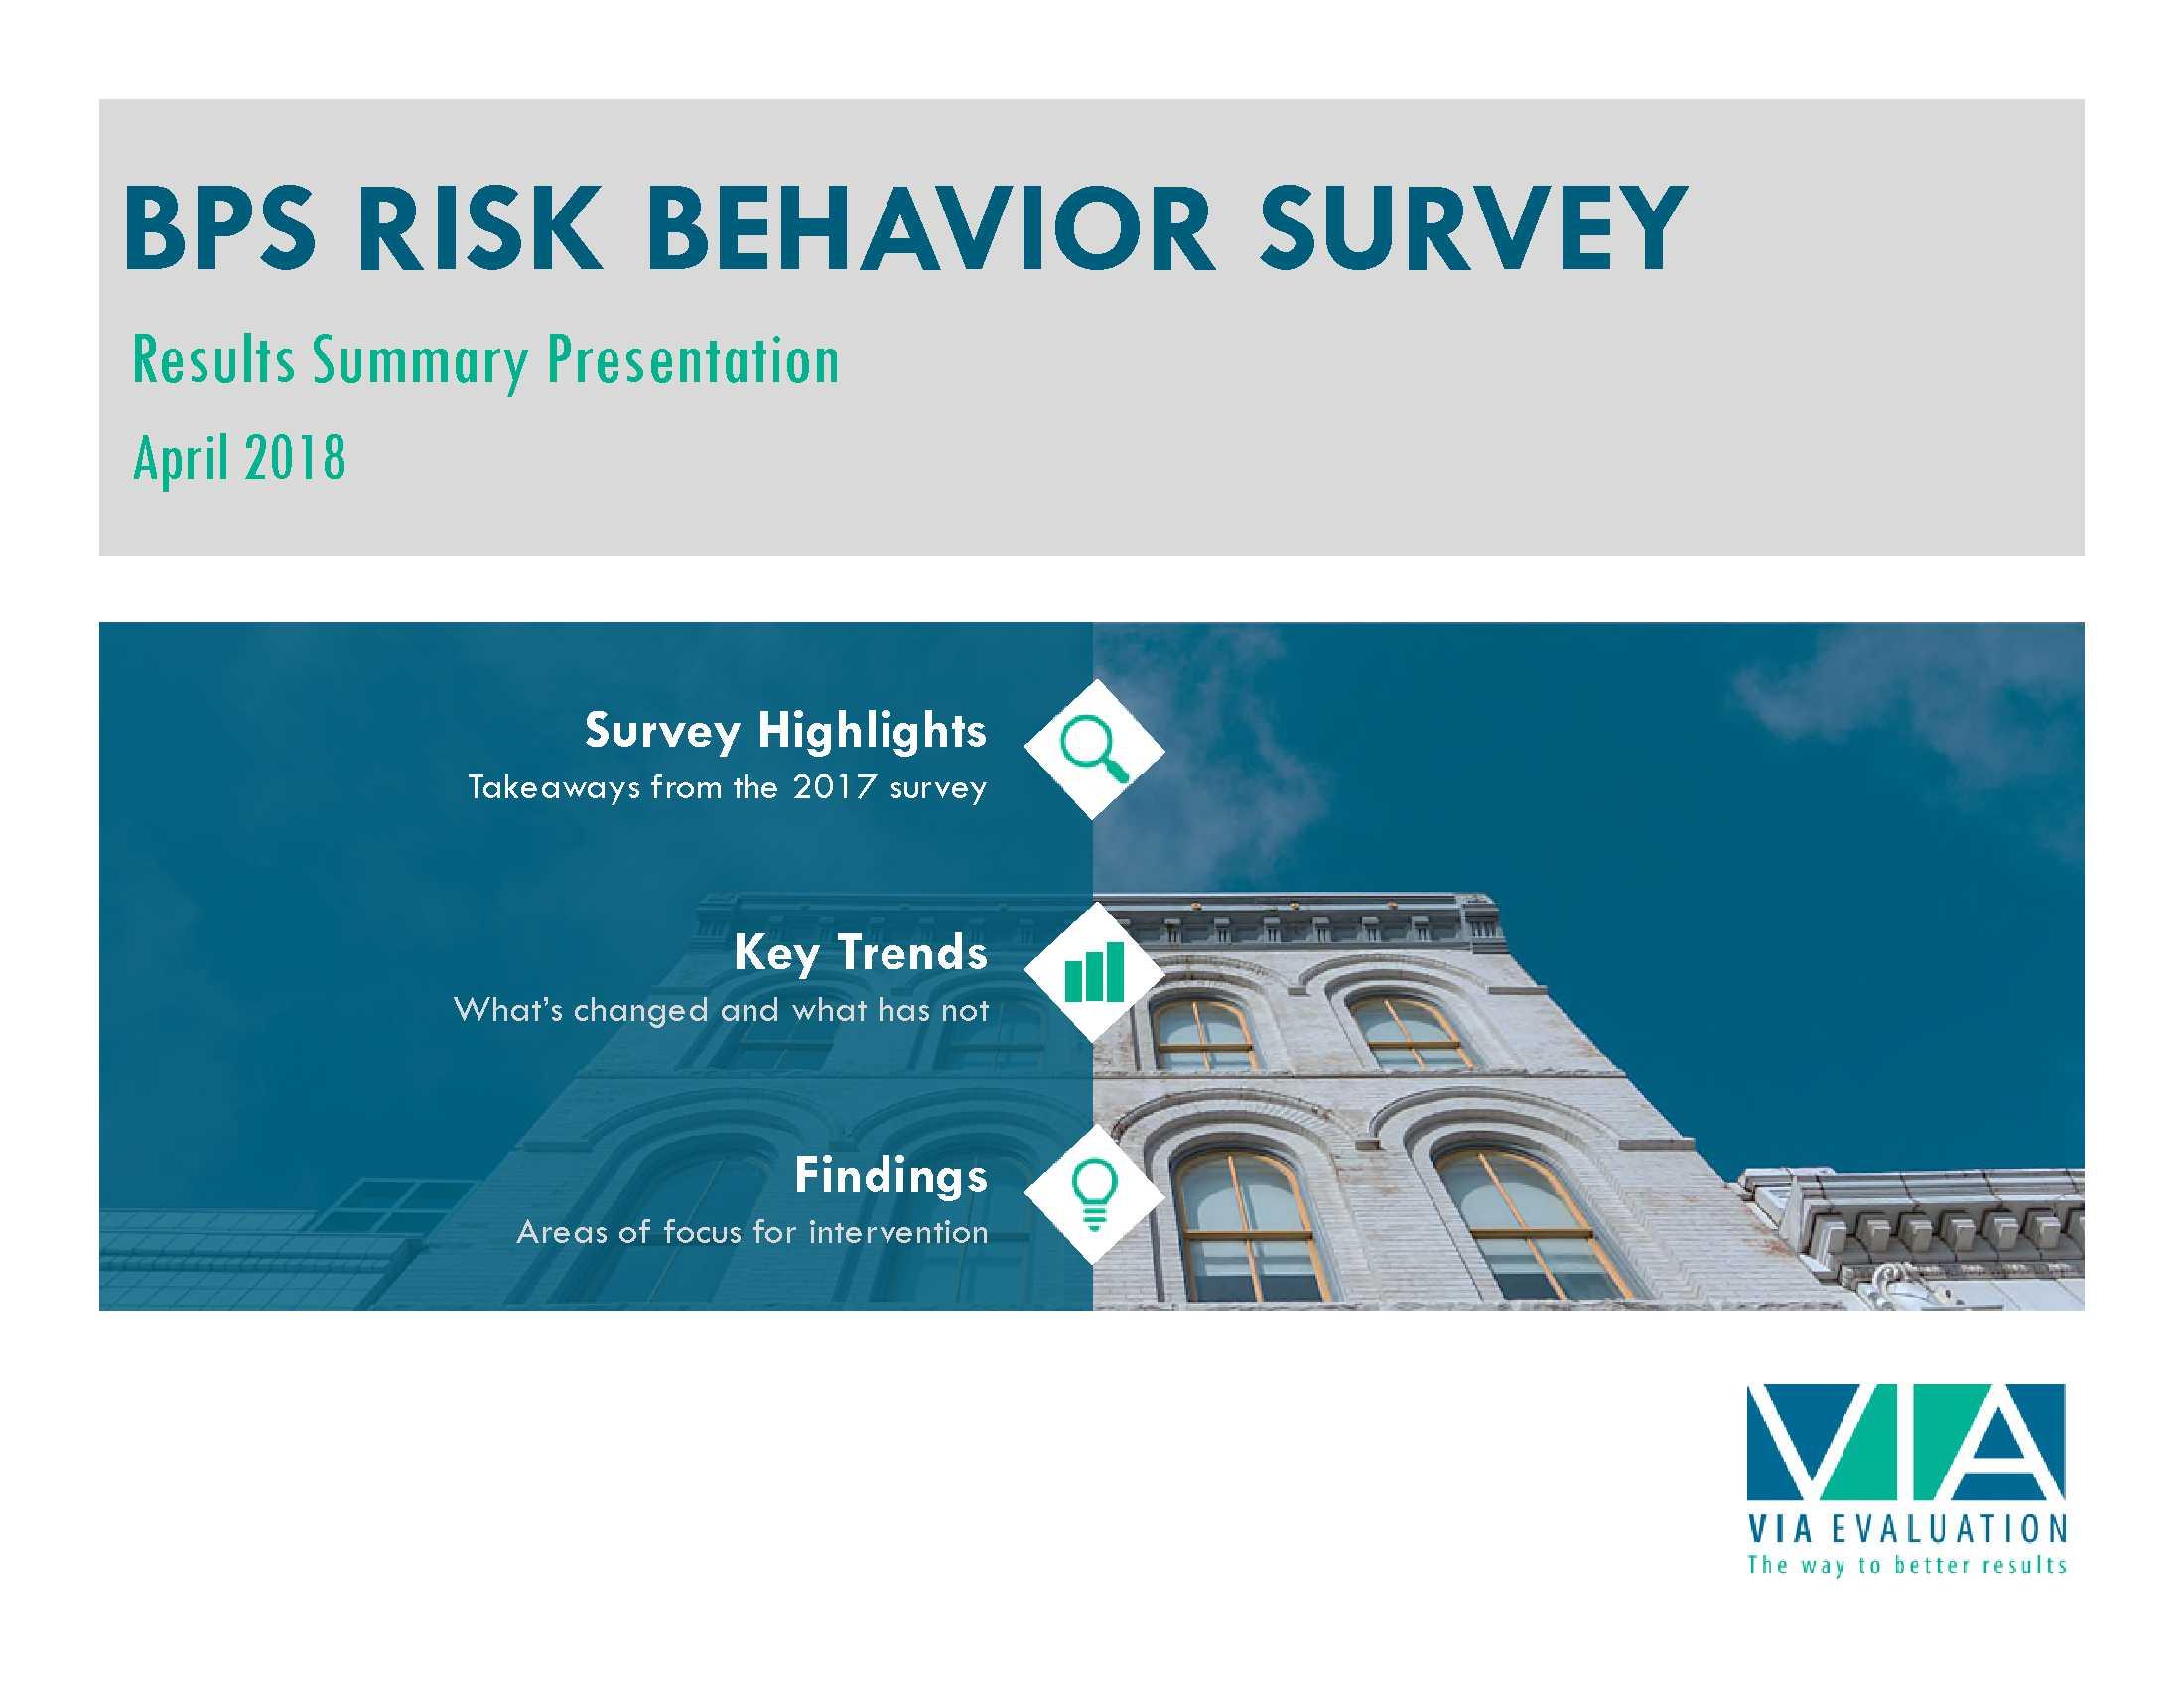 Finding Right Evaluator >> Via Evaluation News